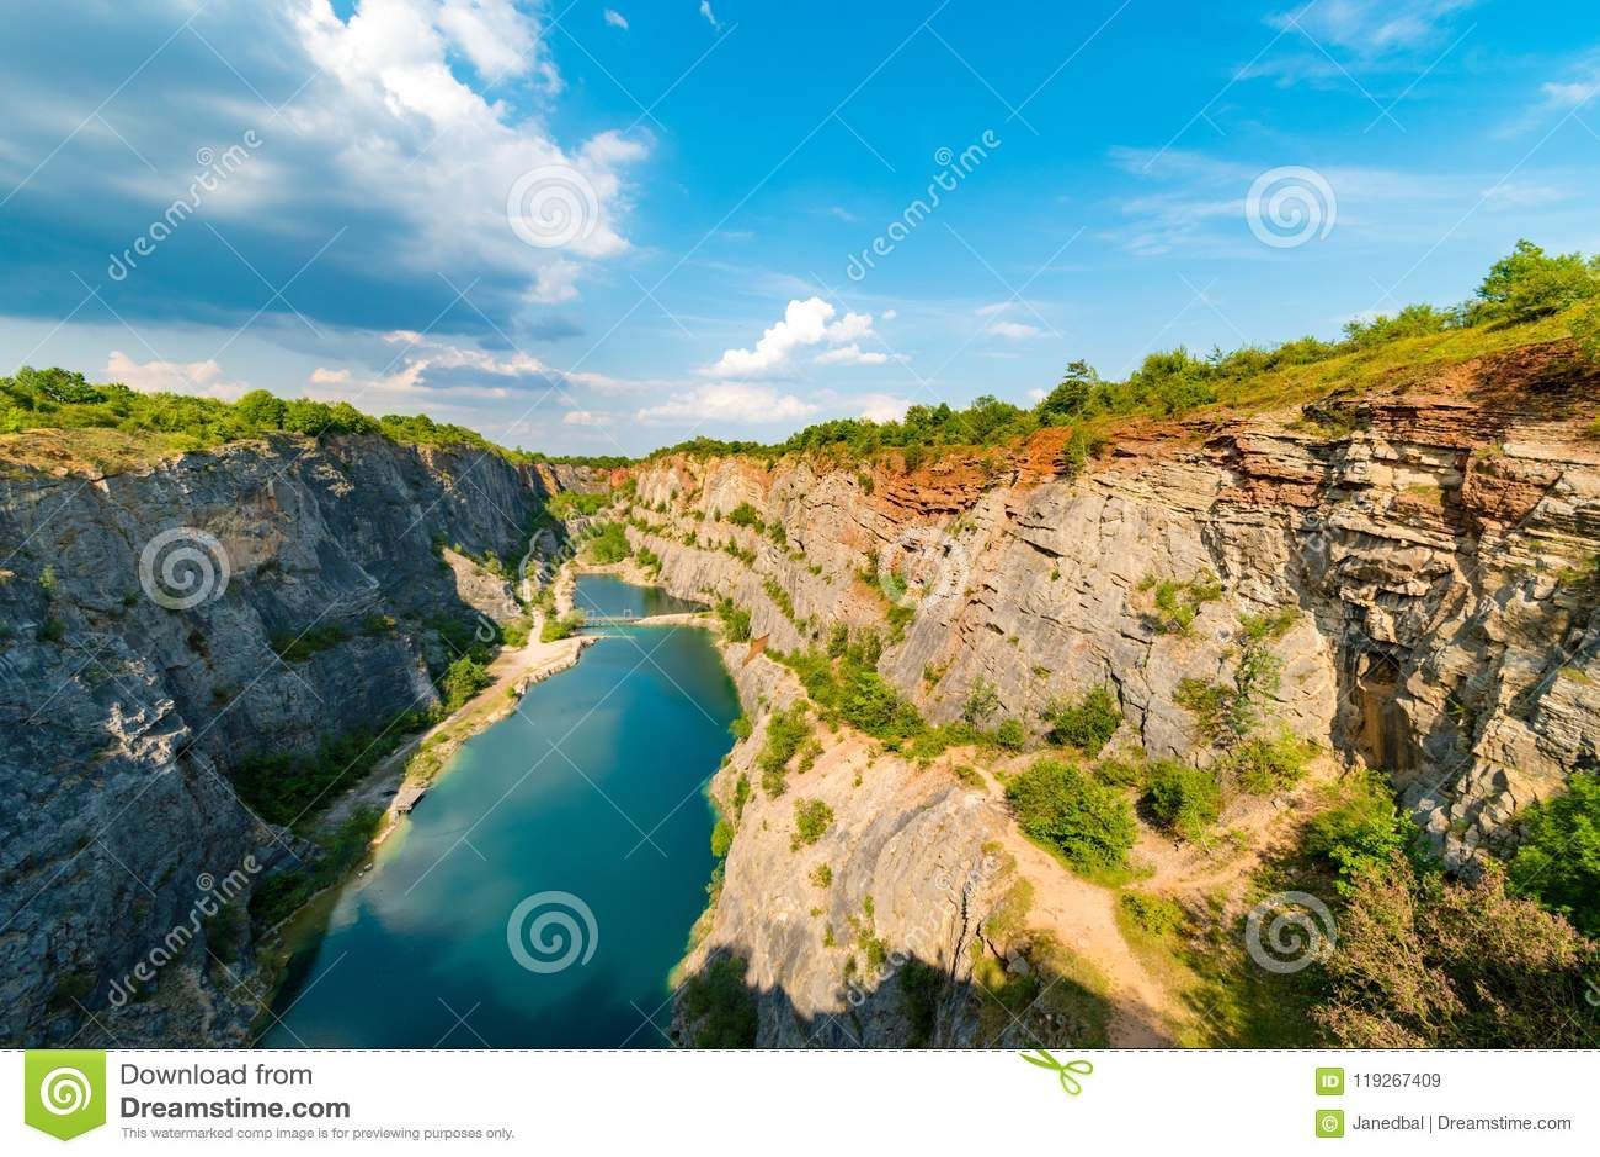 Velka America canyon, abandoned limestone quarry, Centran Bohemian Region, Czech republic